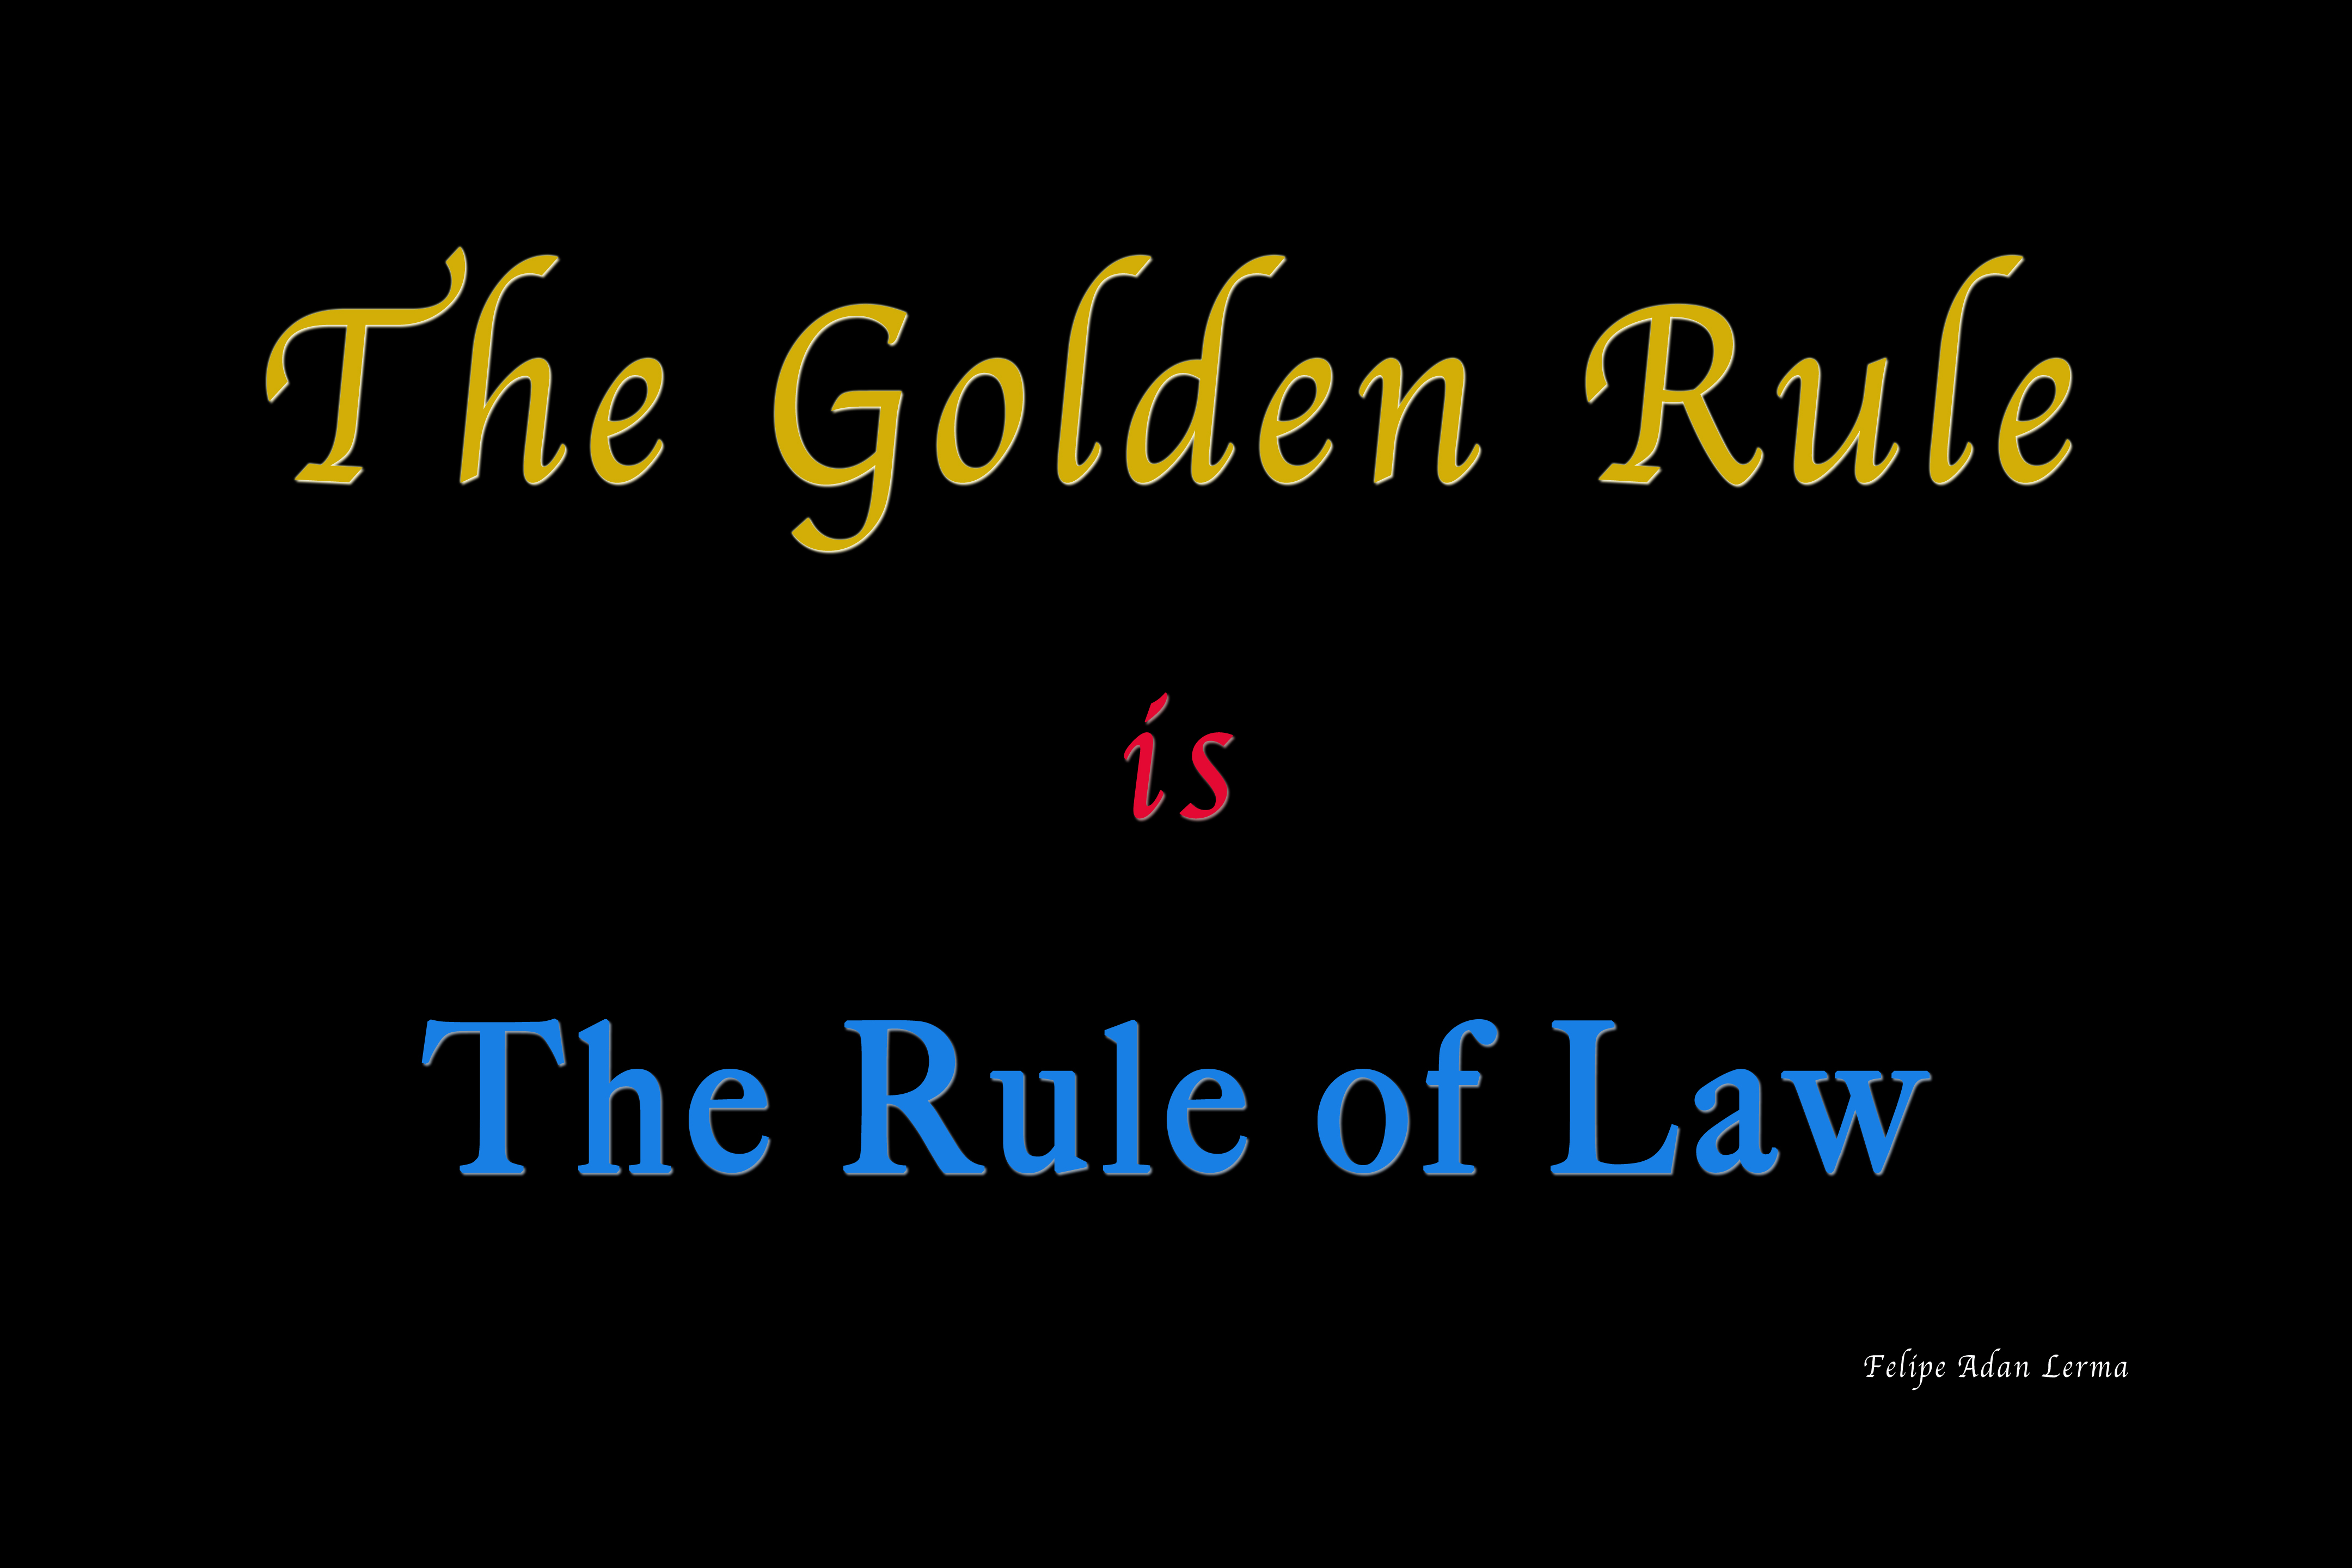 The Golden Rule poster © Felipe Adan Lerma https://fineartamerica.com/featured/the-golden-rule-felipe-adan-lerma.html